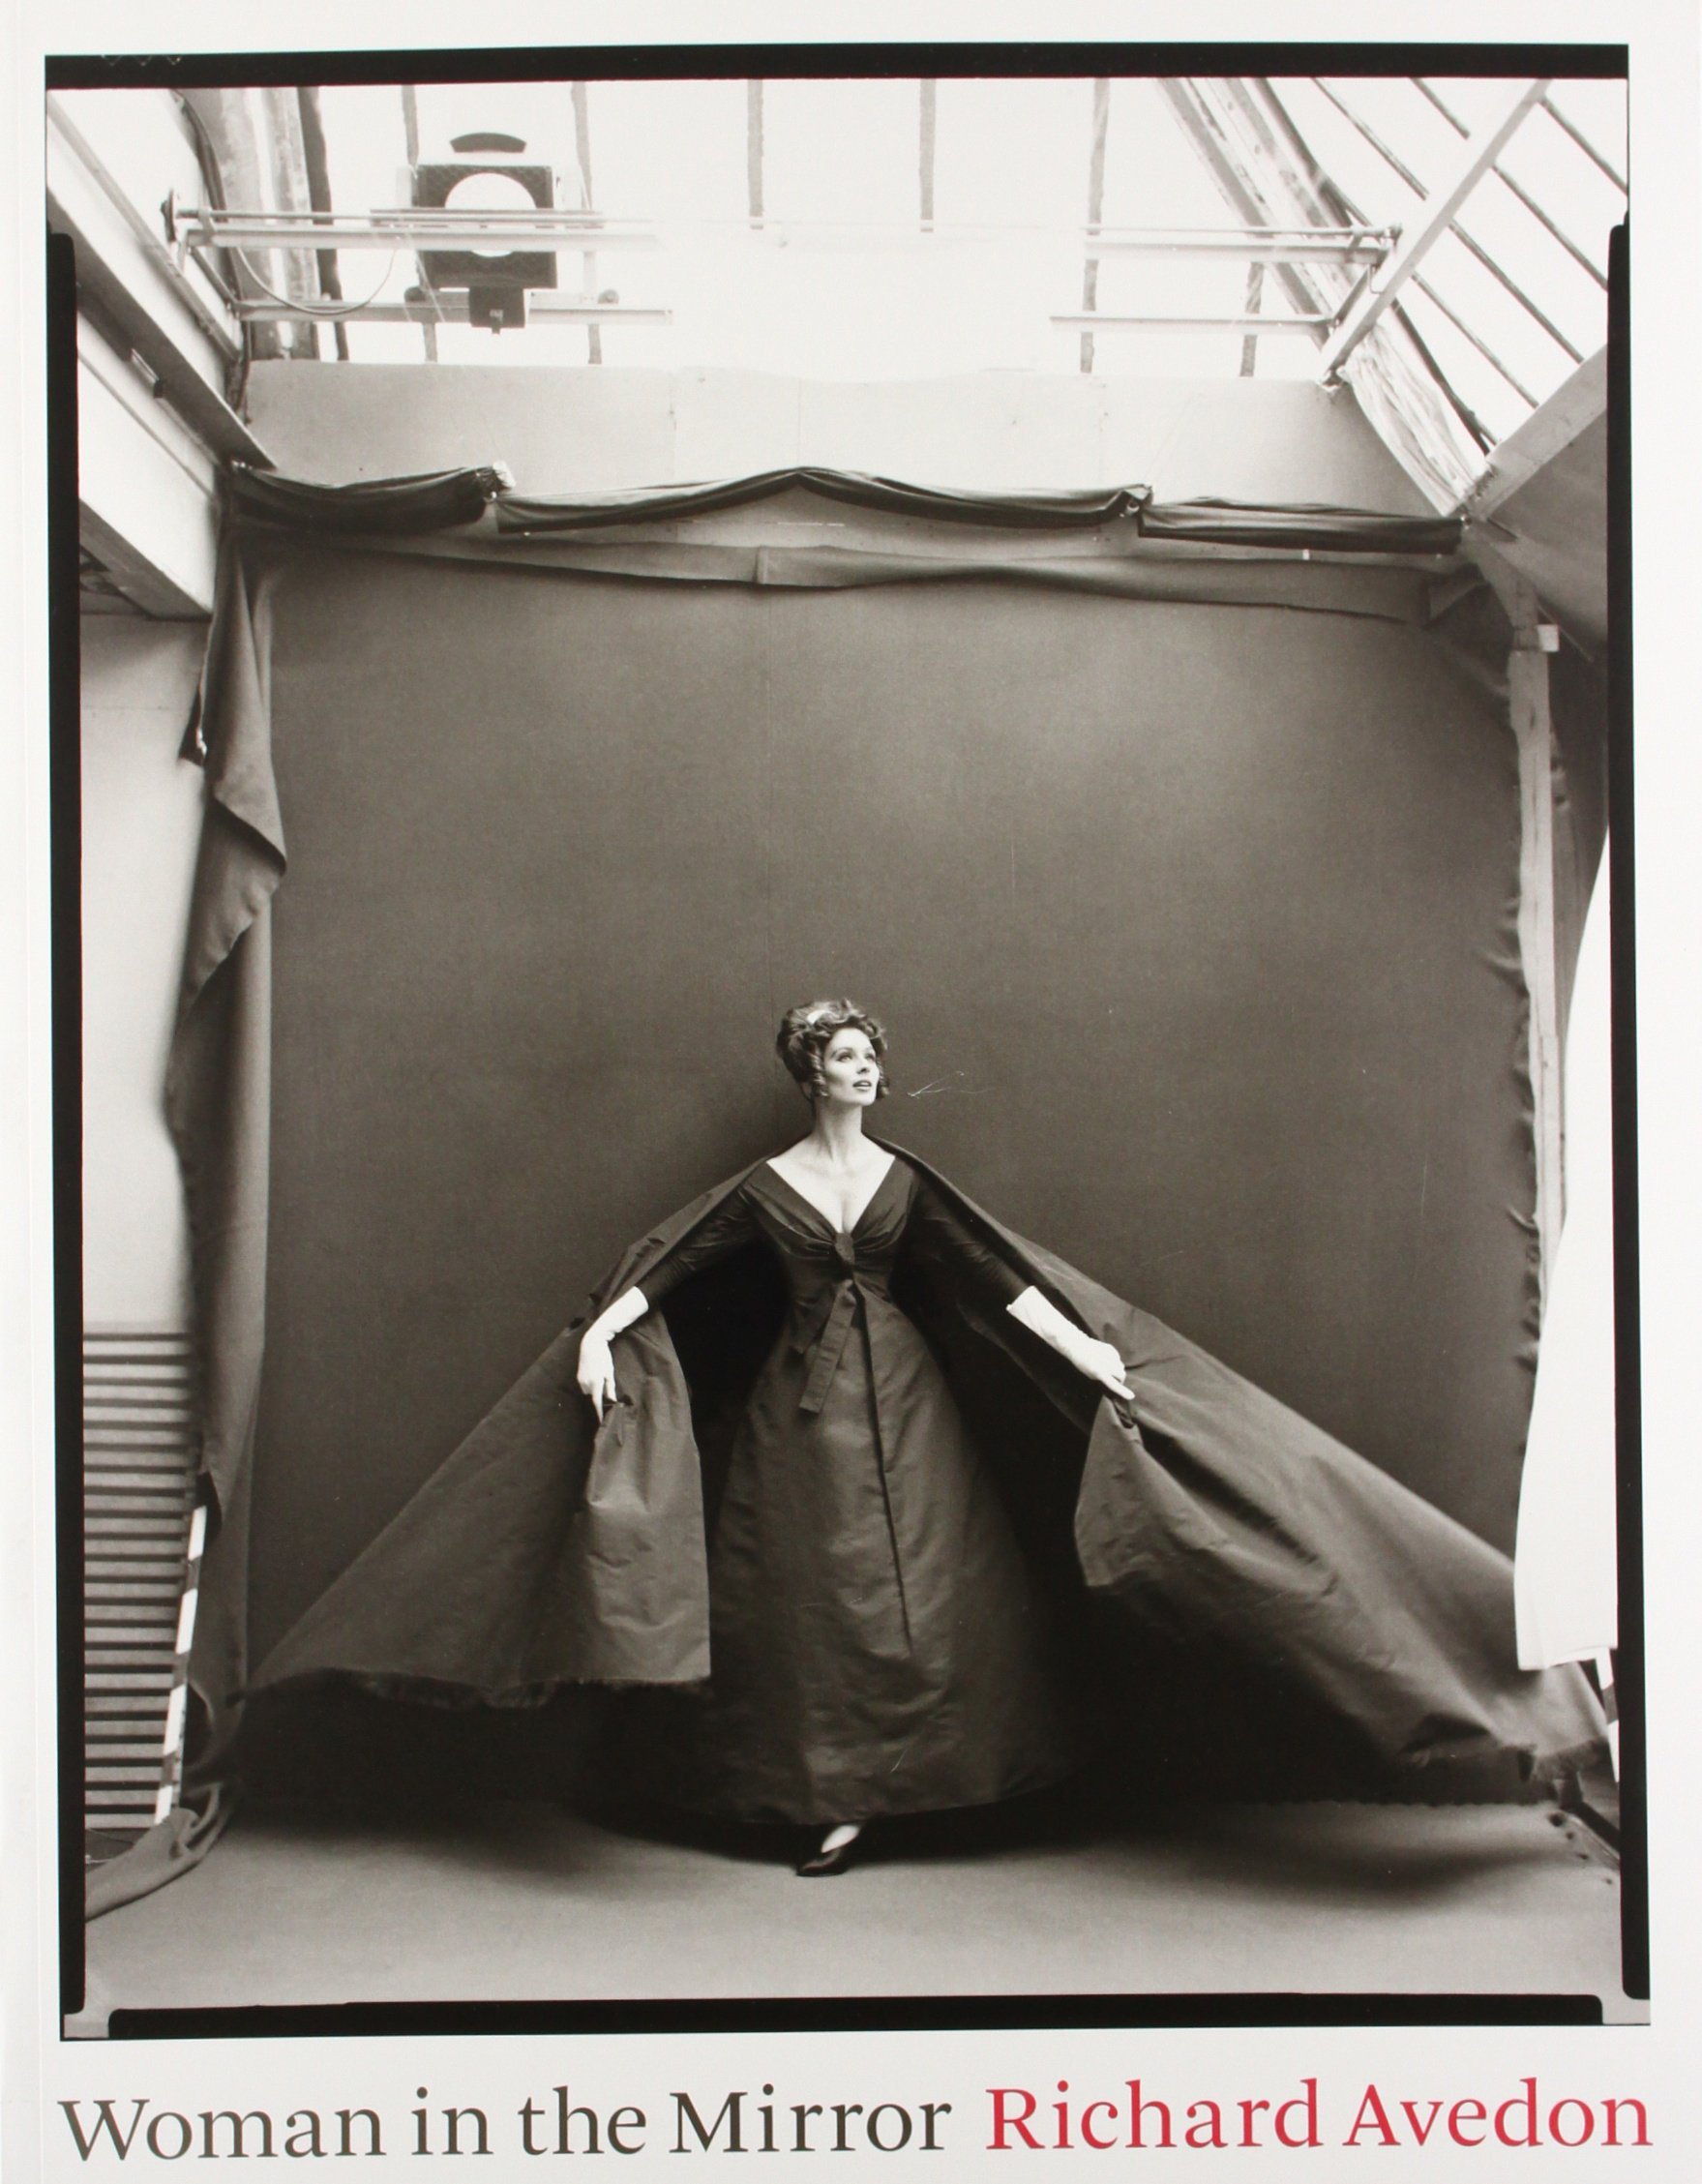 Woman in the Mirror: Richard Avedon: 9783829603676: Amazon.com: Books